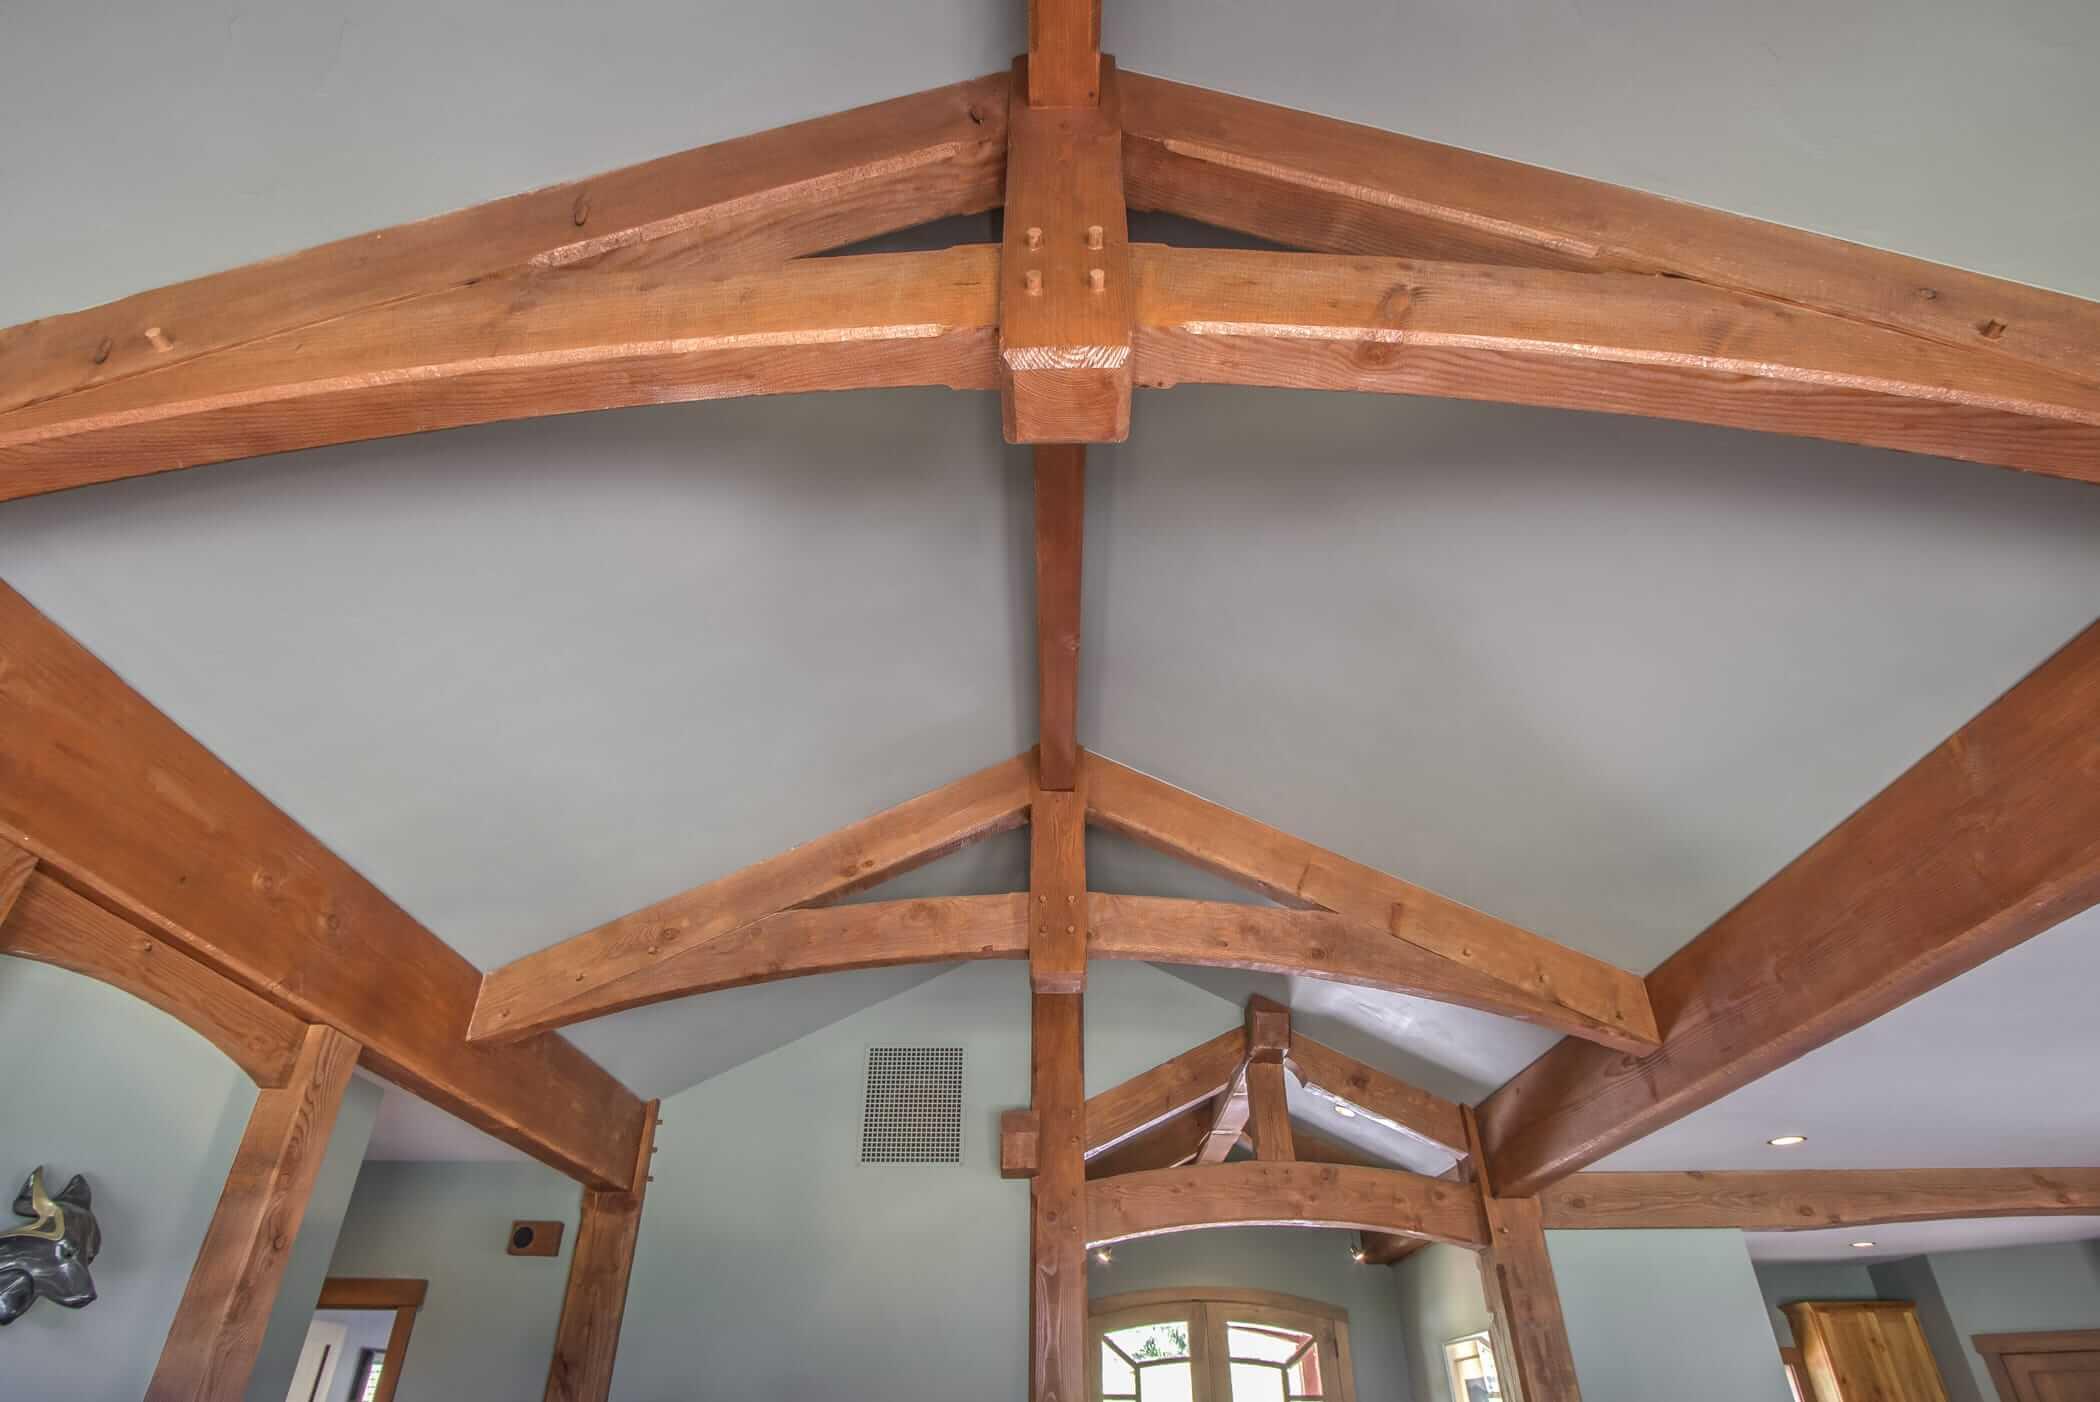 Timber Truss Styles Post Amp Beam Designs For Hybrid